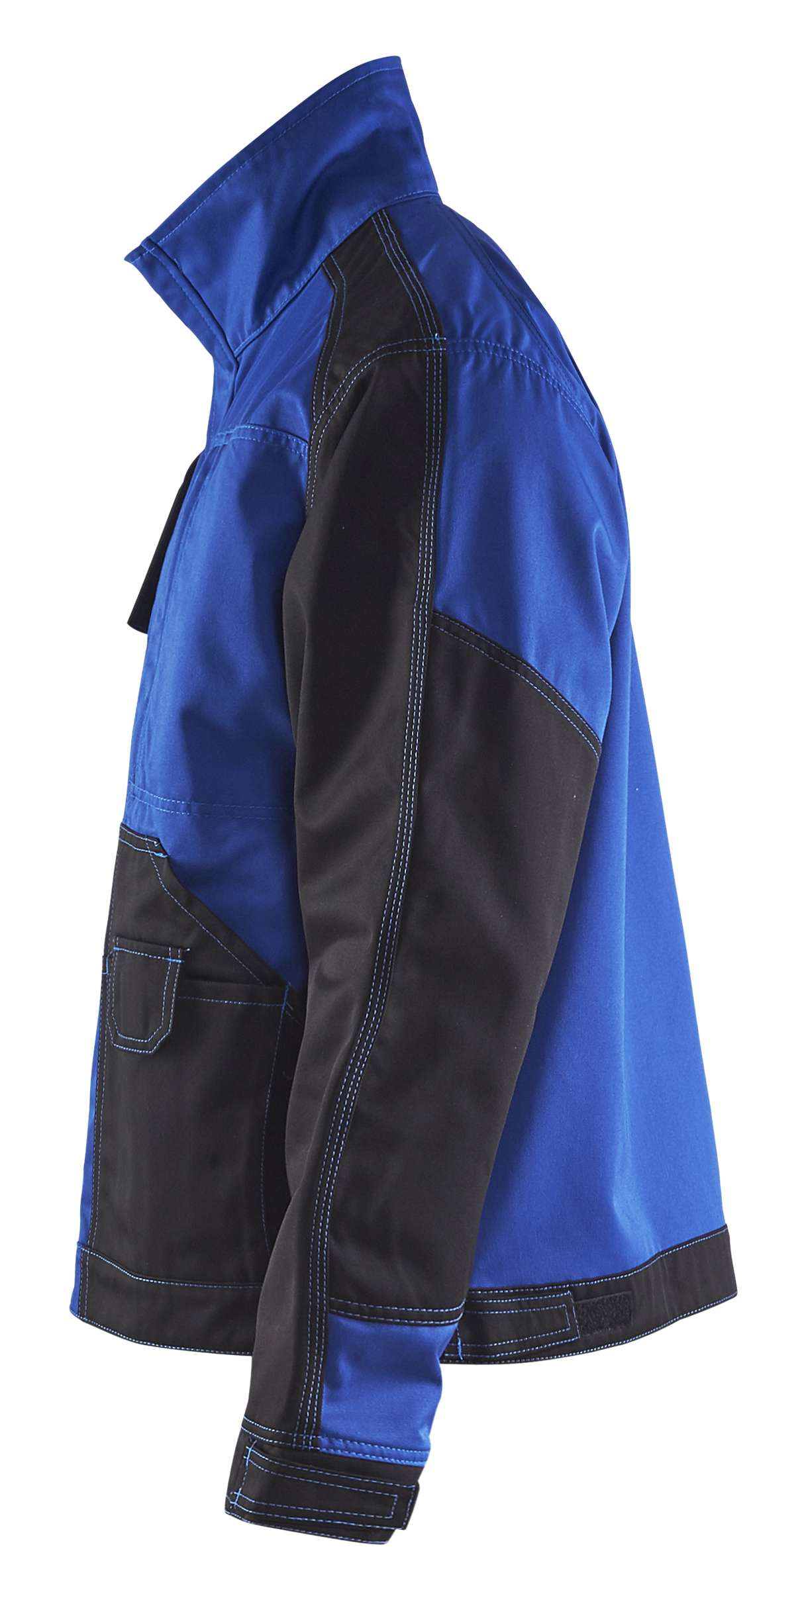 Blaklader Combi-jacks 40631860 korenblauw-zwart(8599)